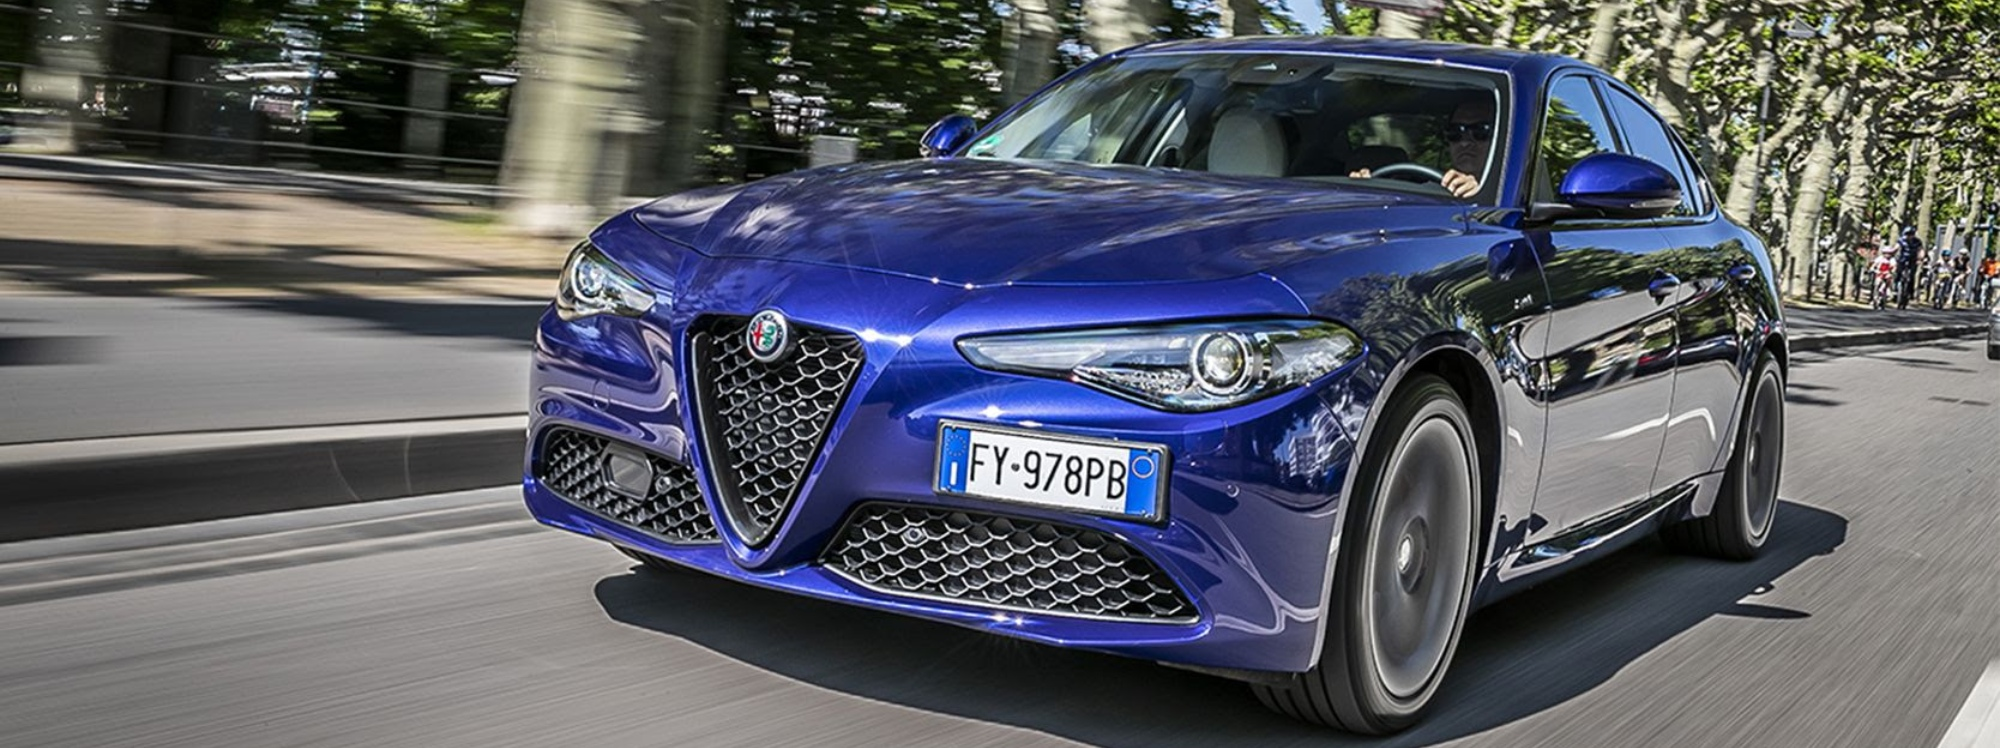 "El Alfa Romeo Giulia gana el título de ""Best Car"""